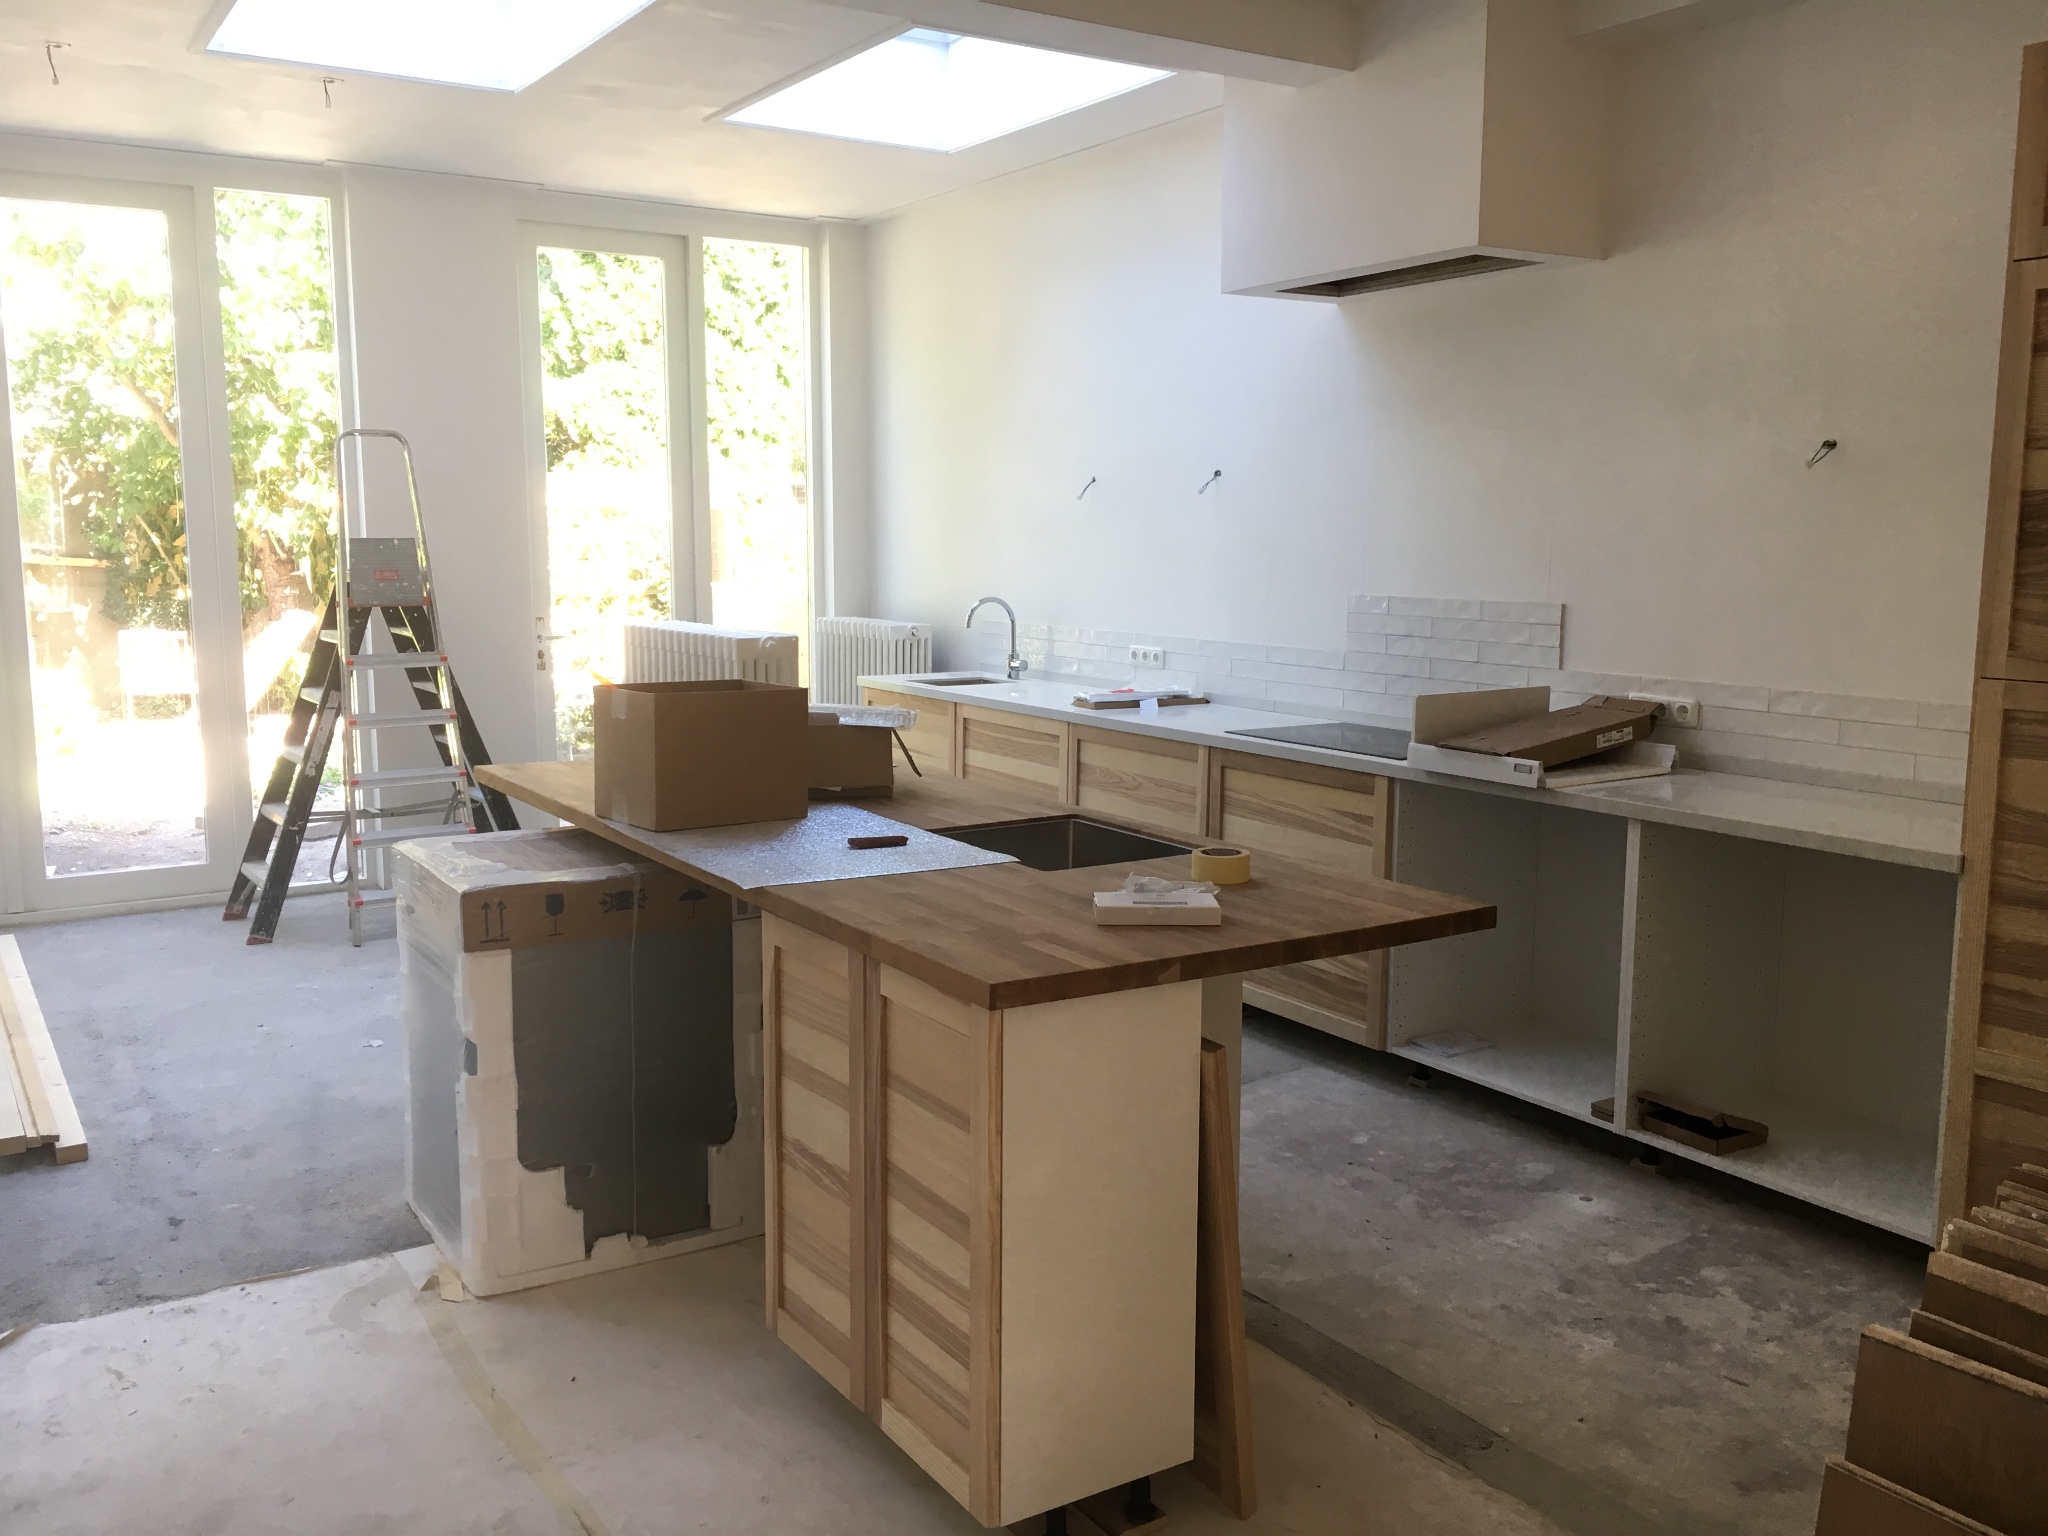 Keuken Verven Ikea : Keuken ikea torhamn schilderen werkspot